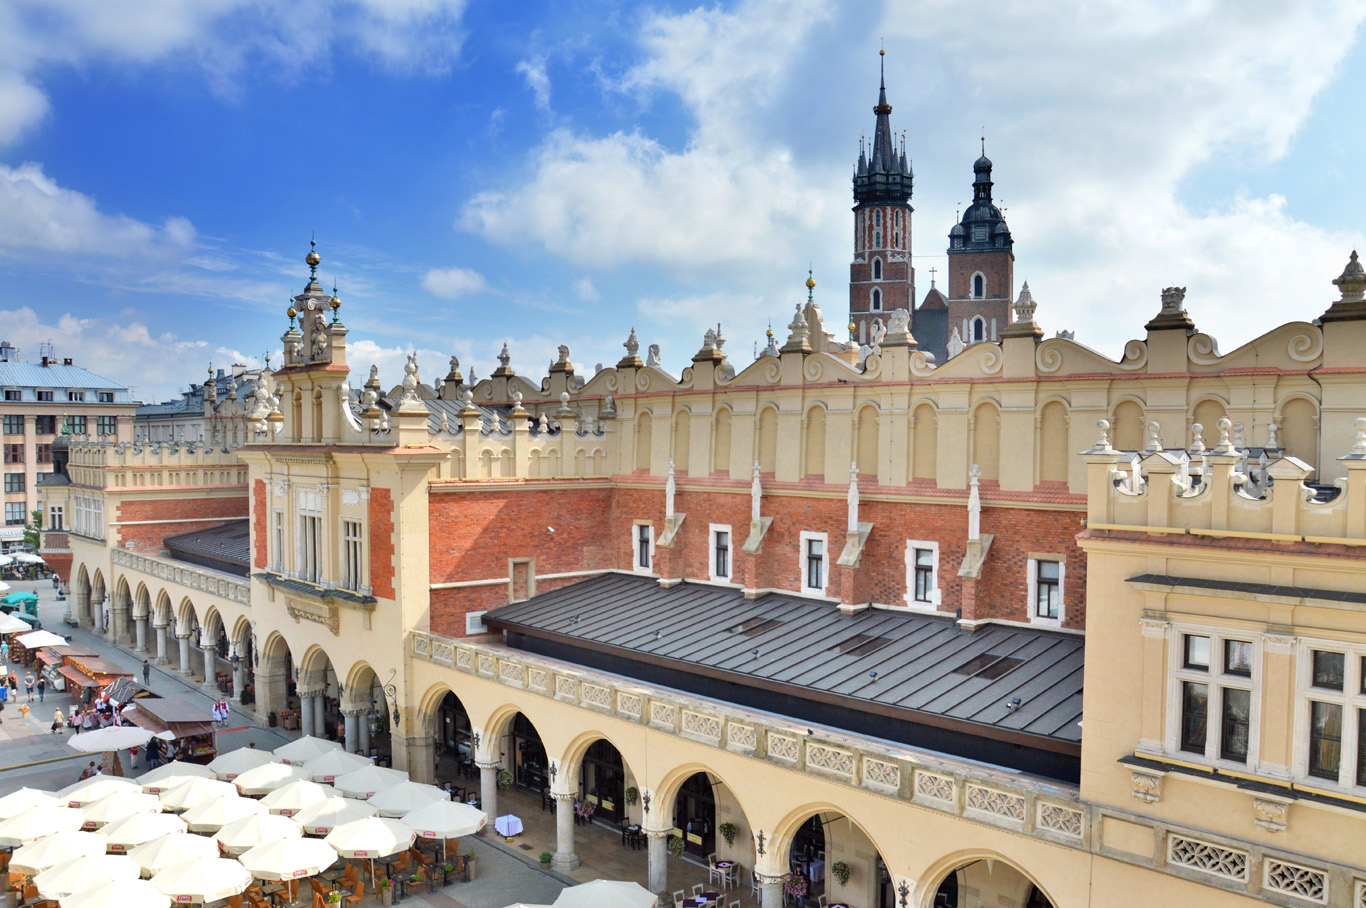 Market square - Cloth Hall